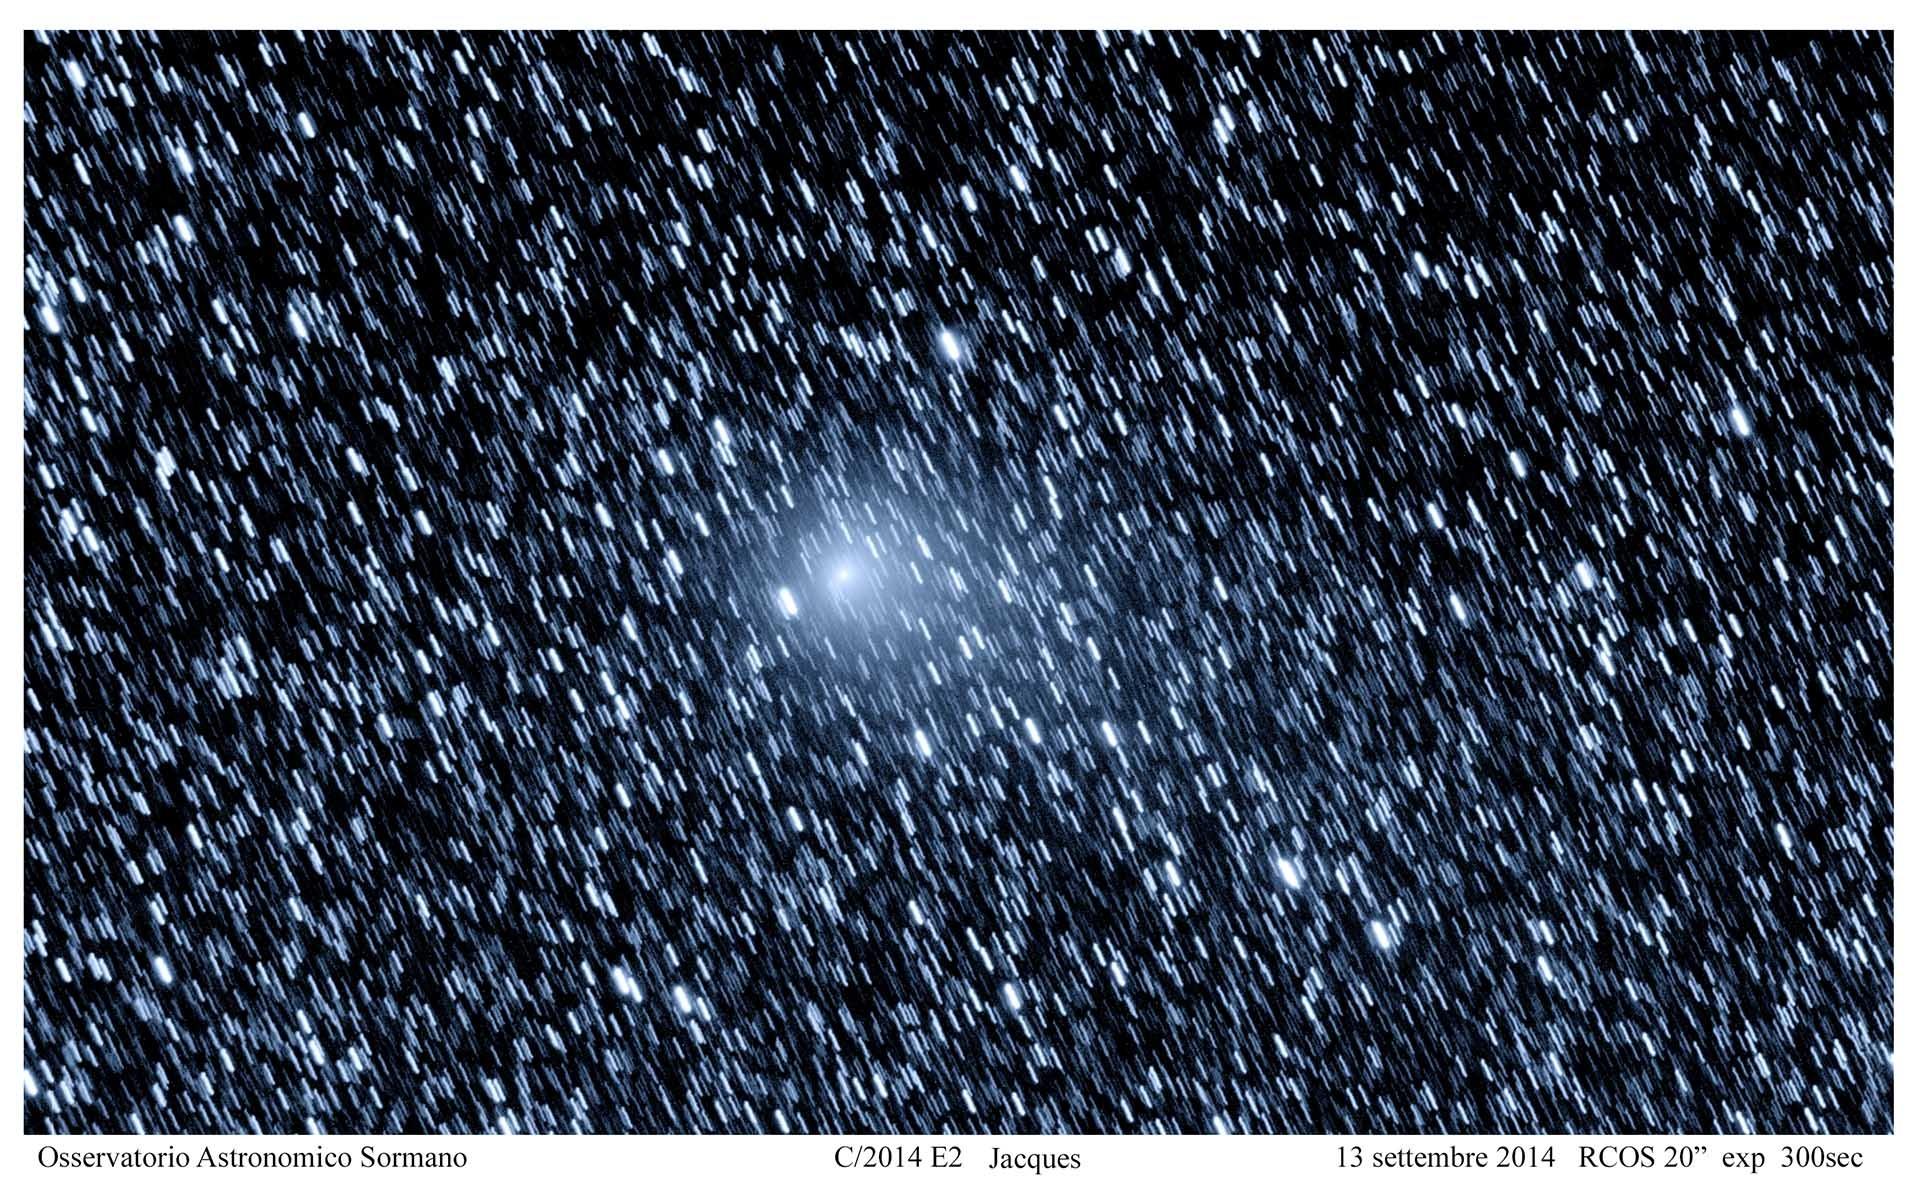 La cometa Jacques